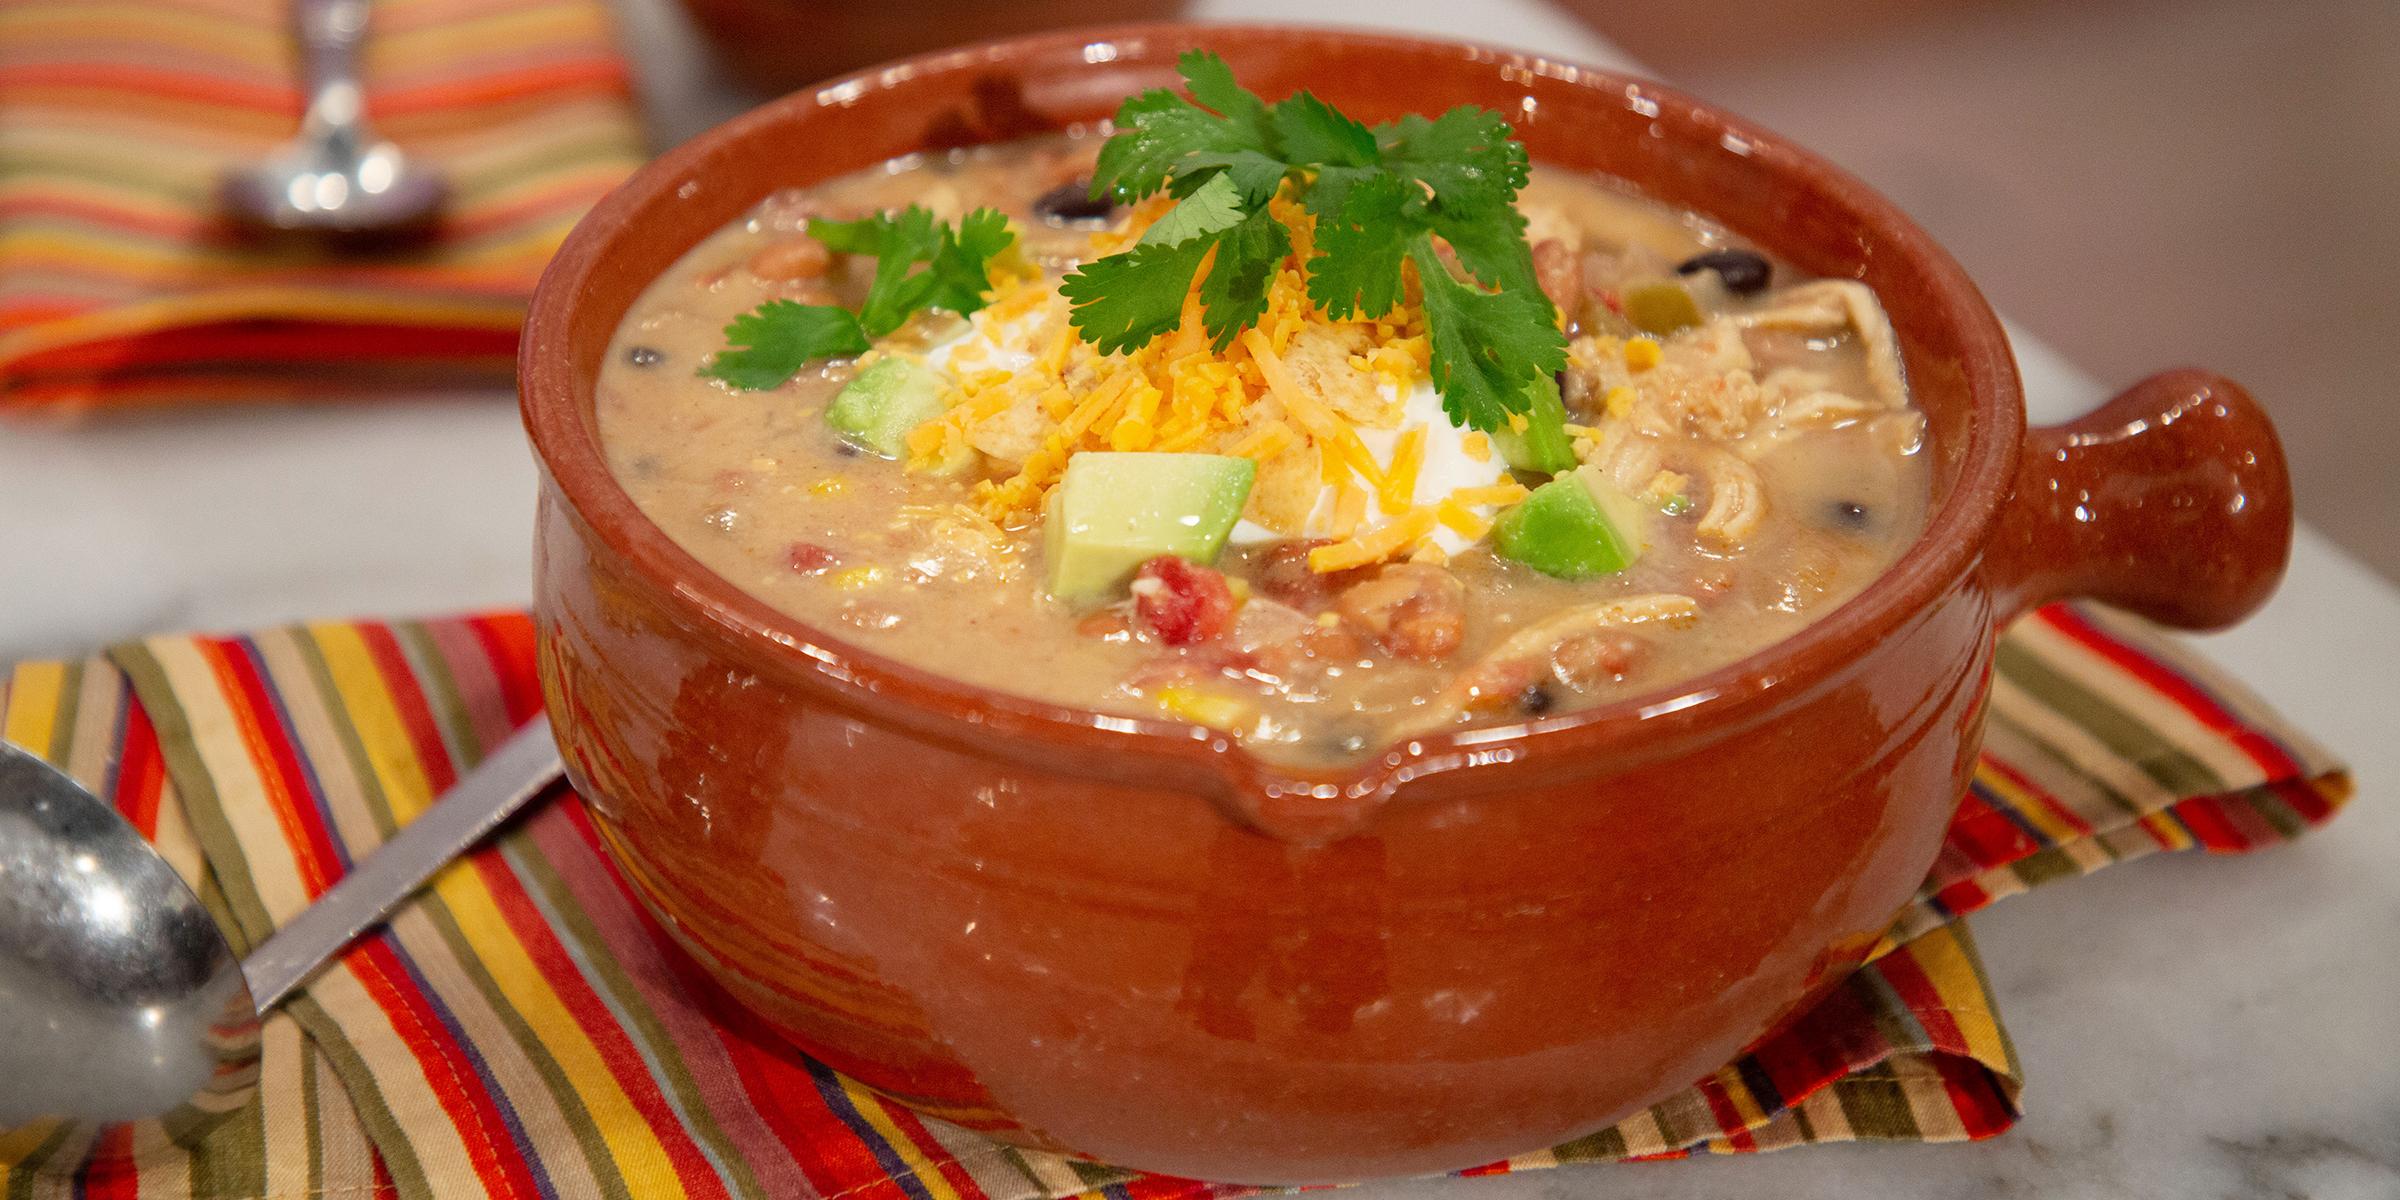 martina mcbride s creamy chicken tortilla soup today com